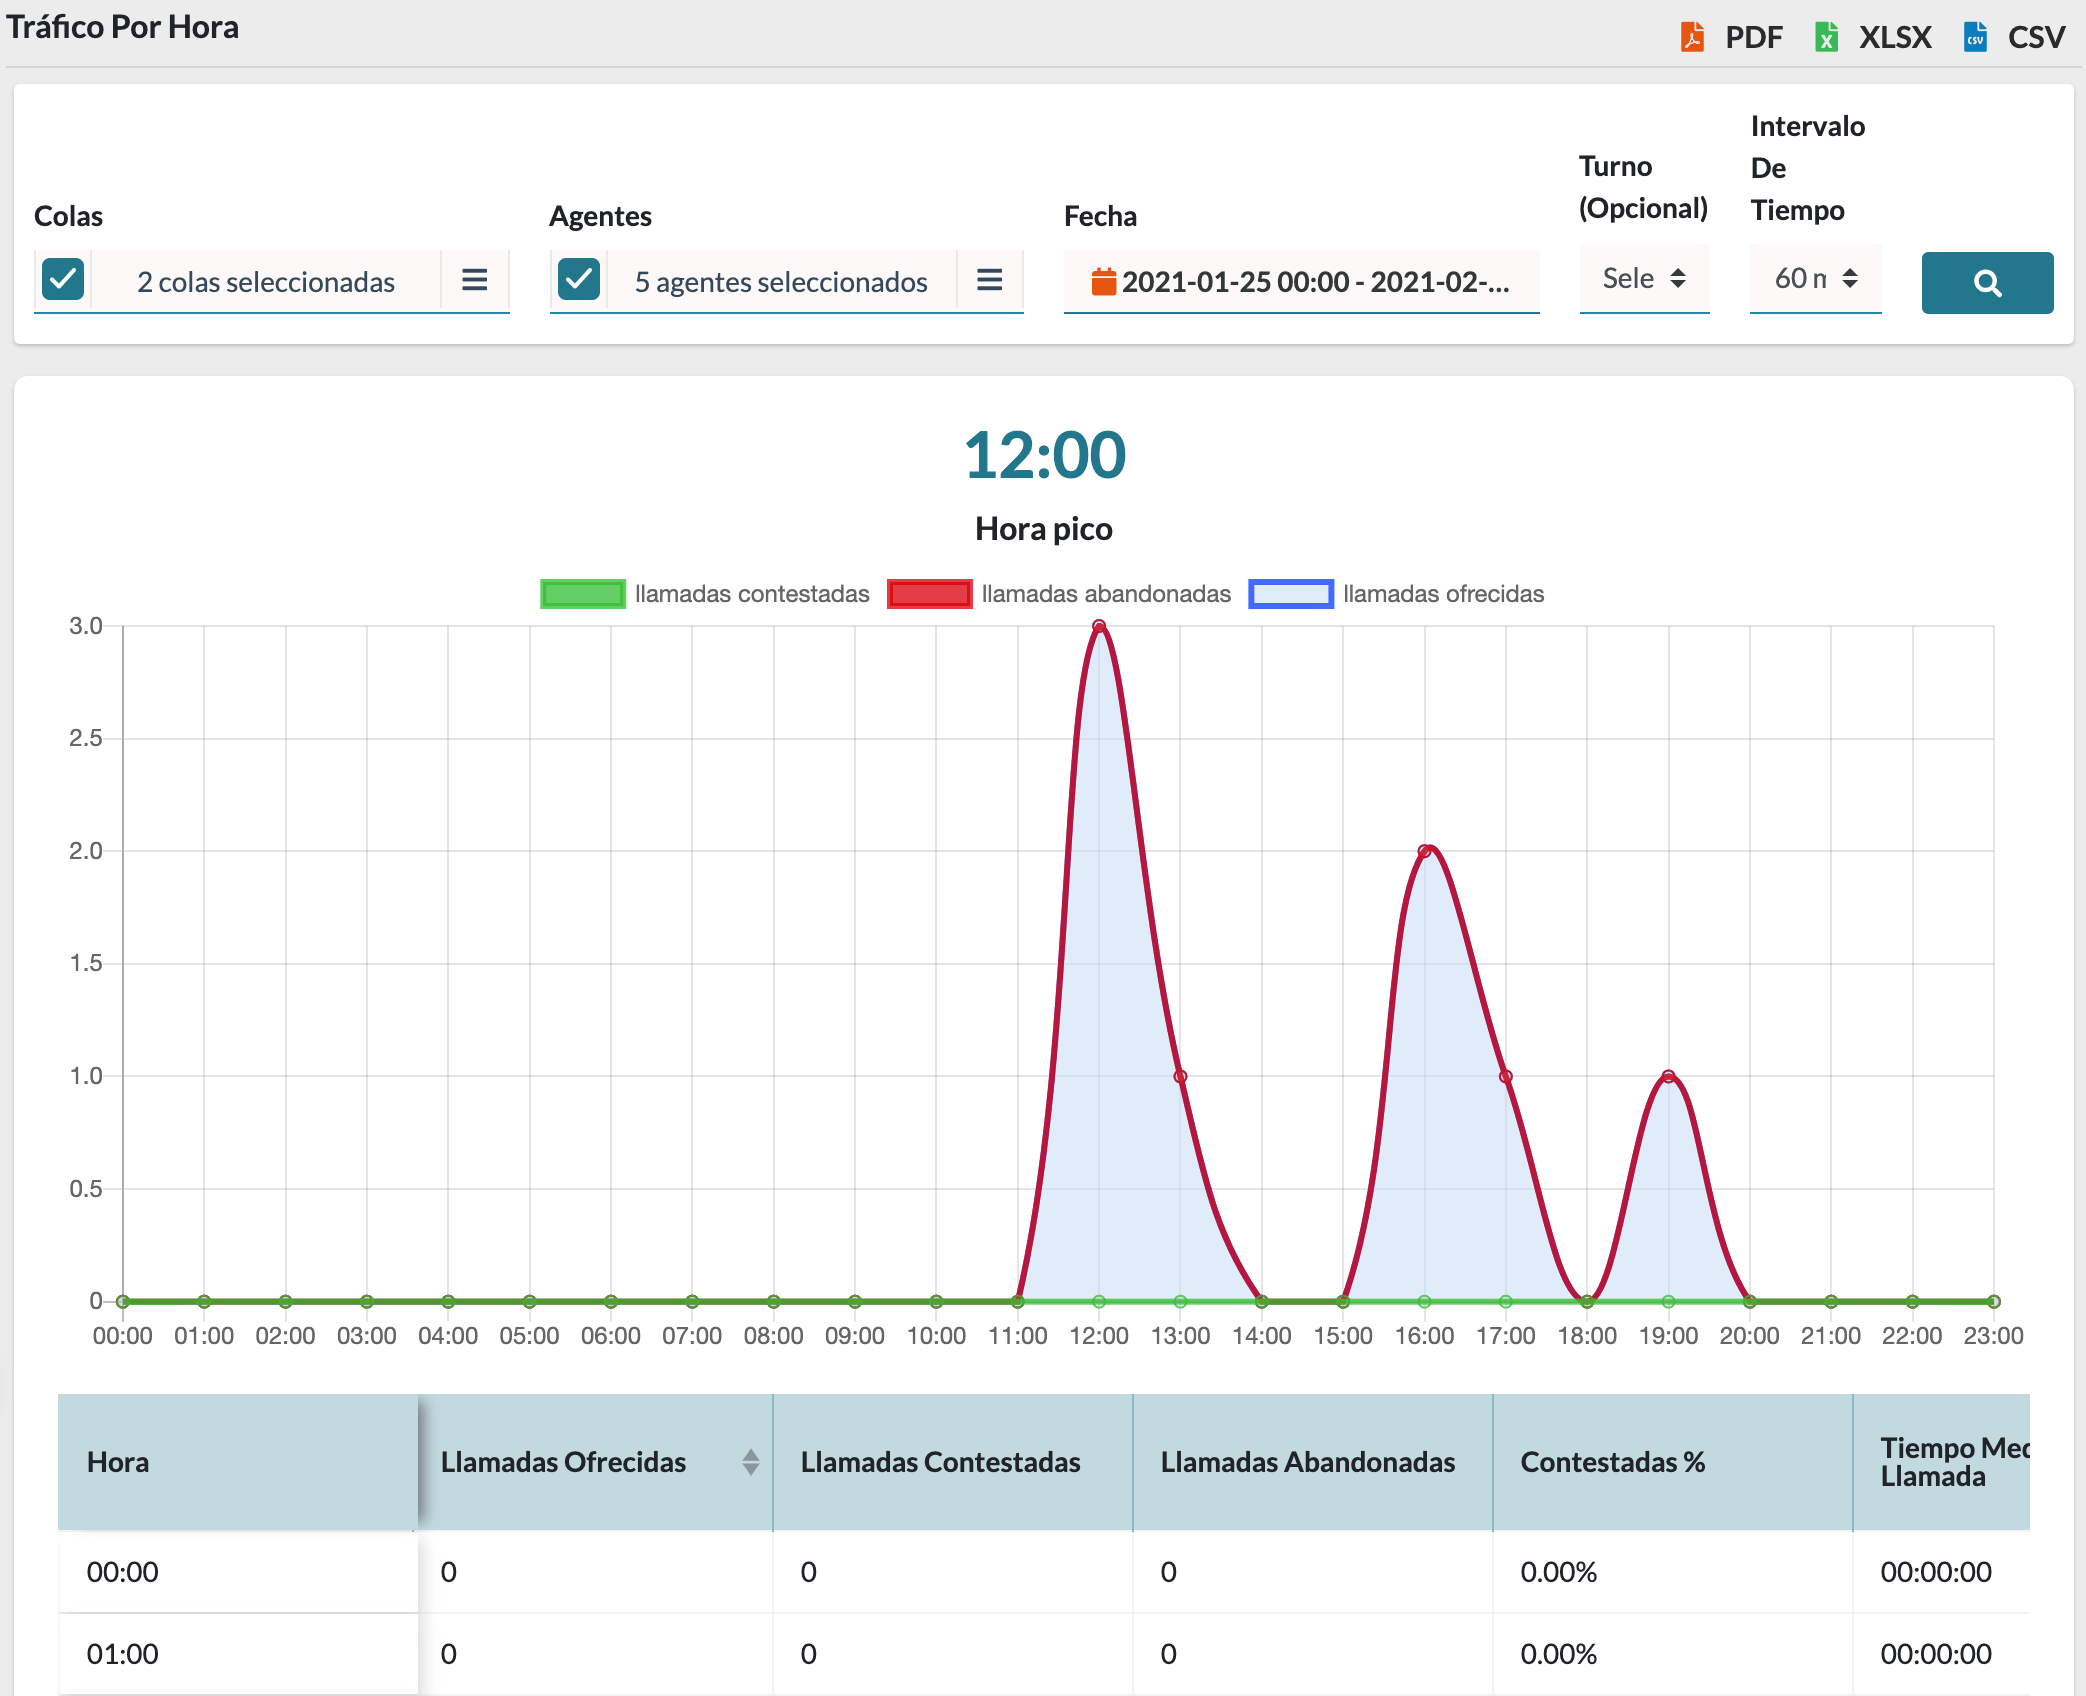 Informe de trafico en la virtual PBX